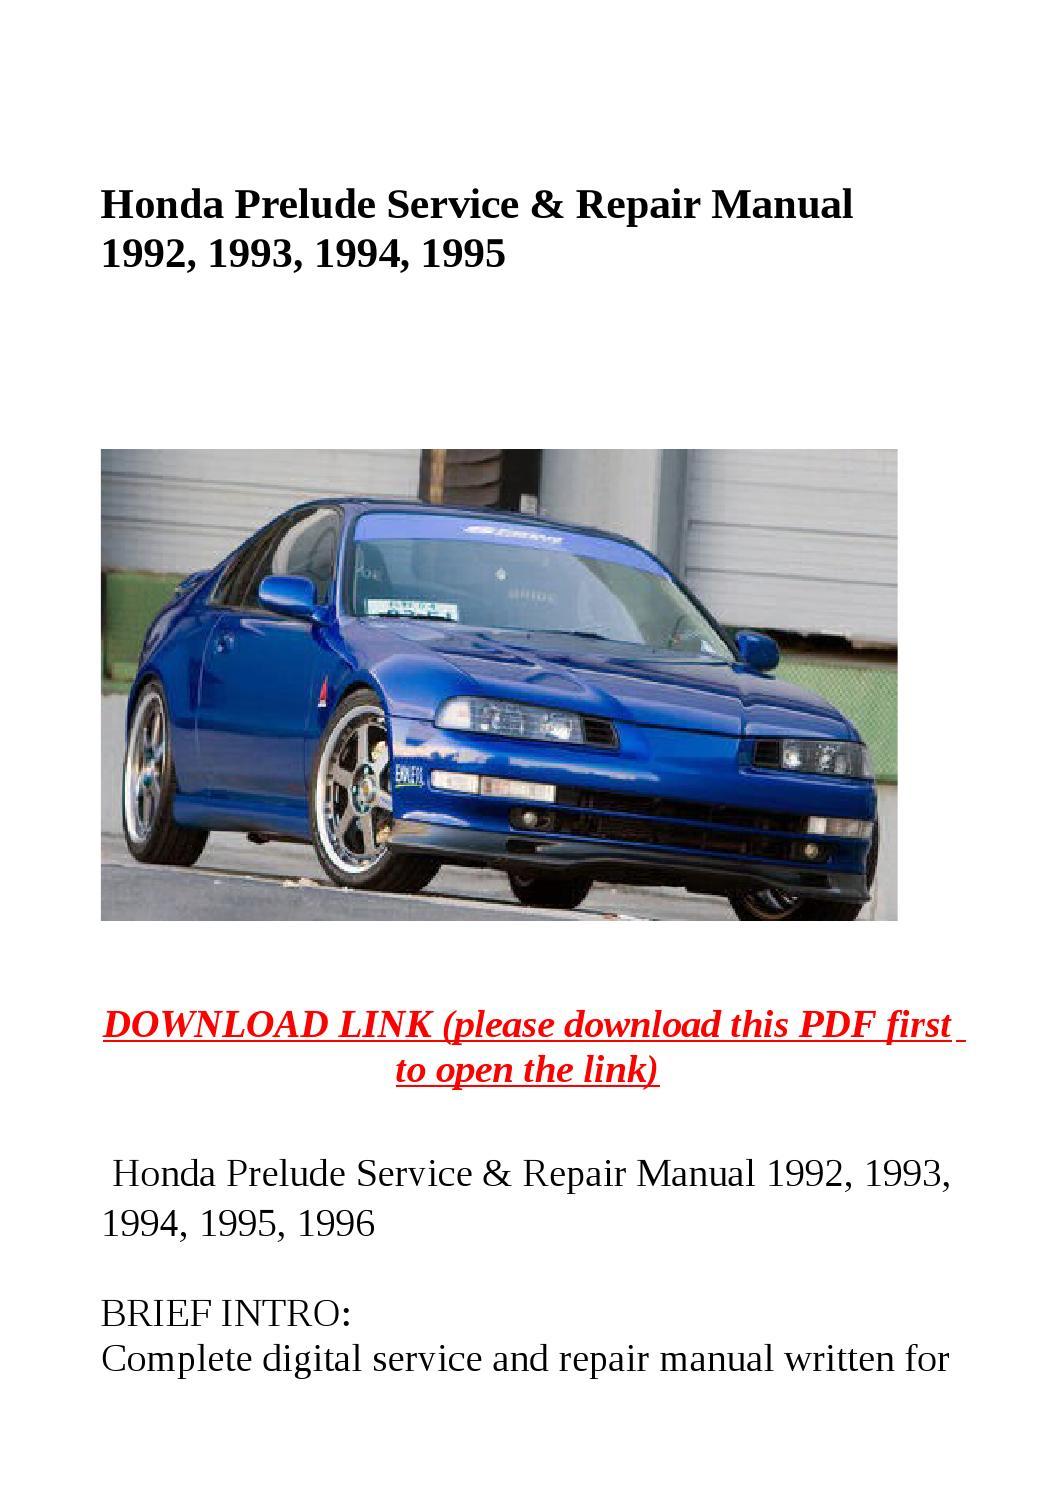 1995 honda prelude service manual pdf